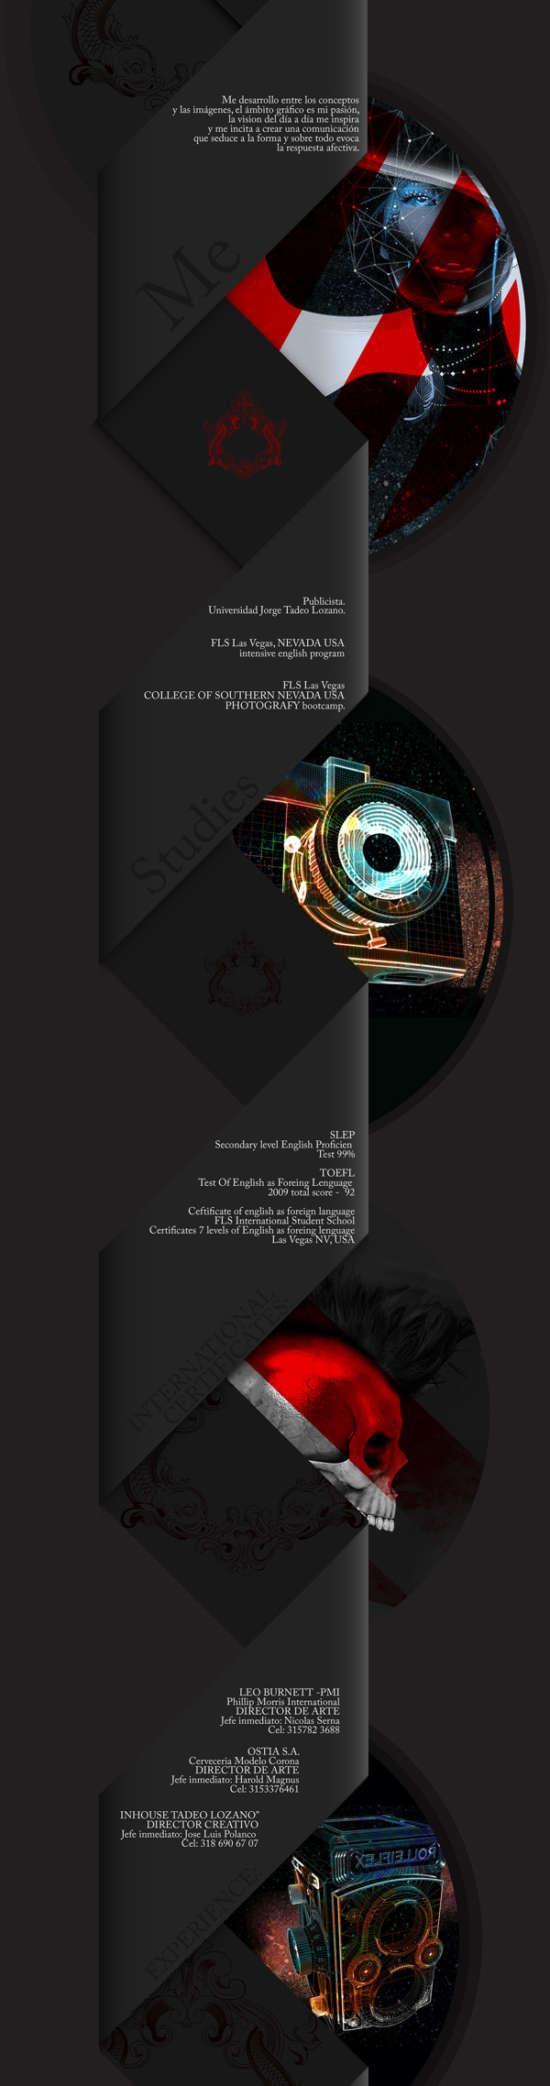 creative_curriculum_vitae_by_carlos_bedoya